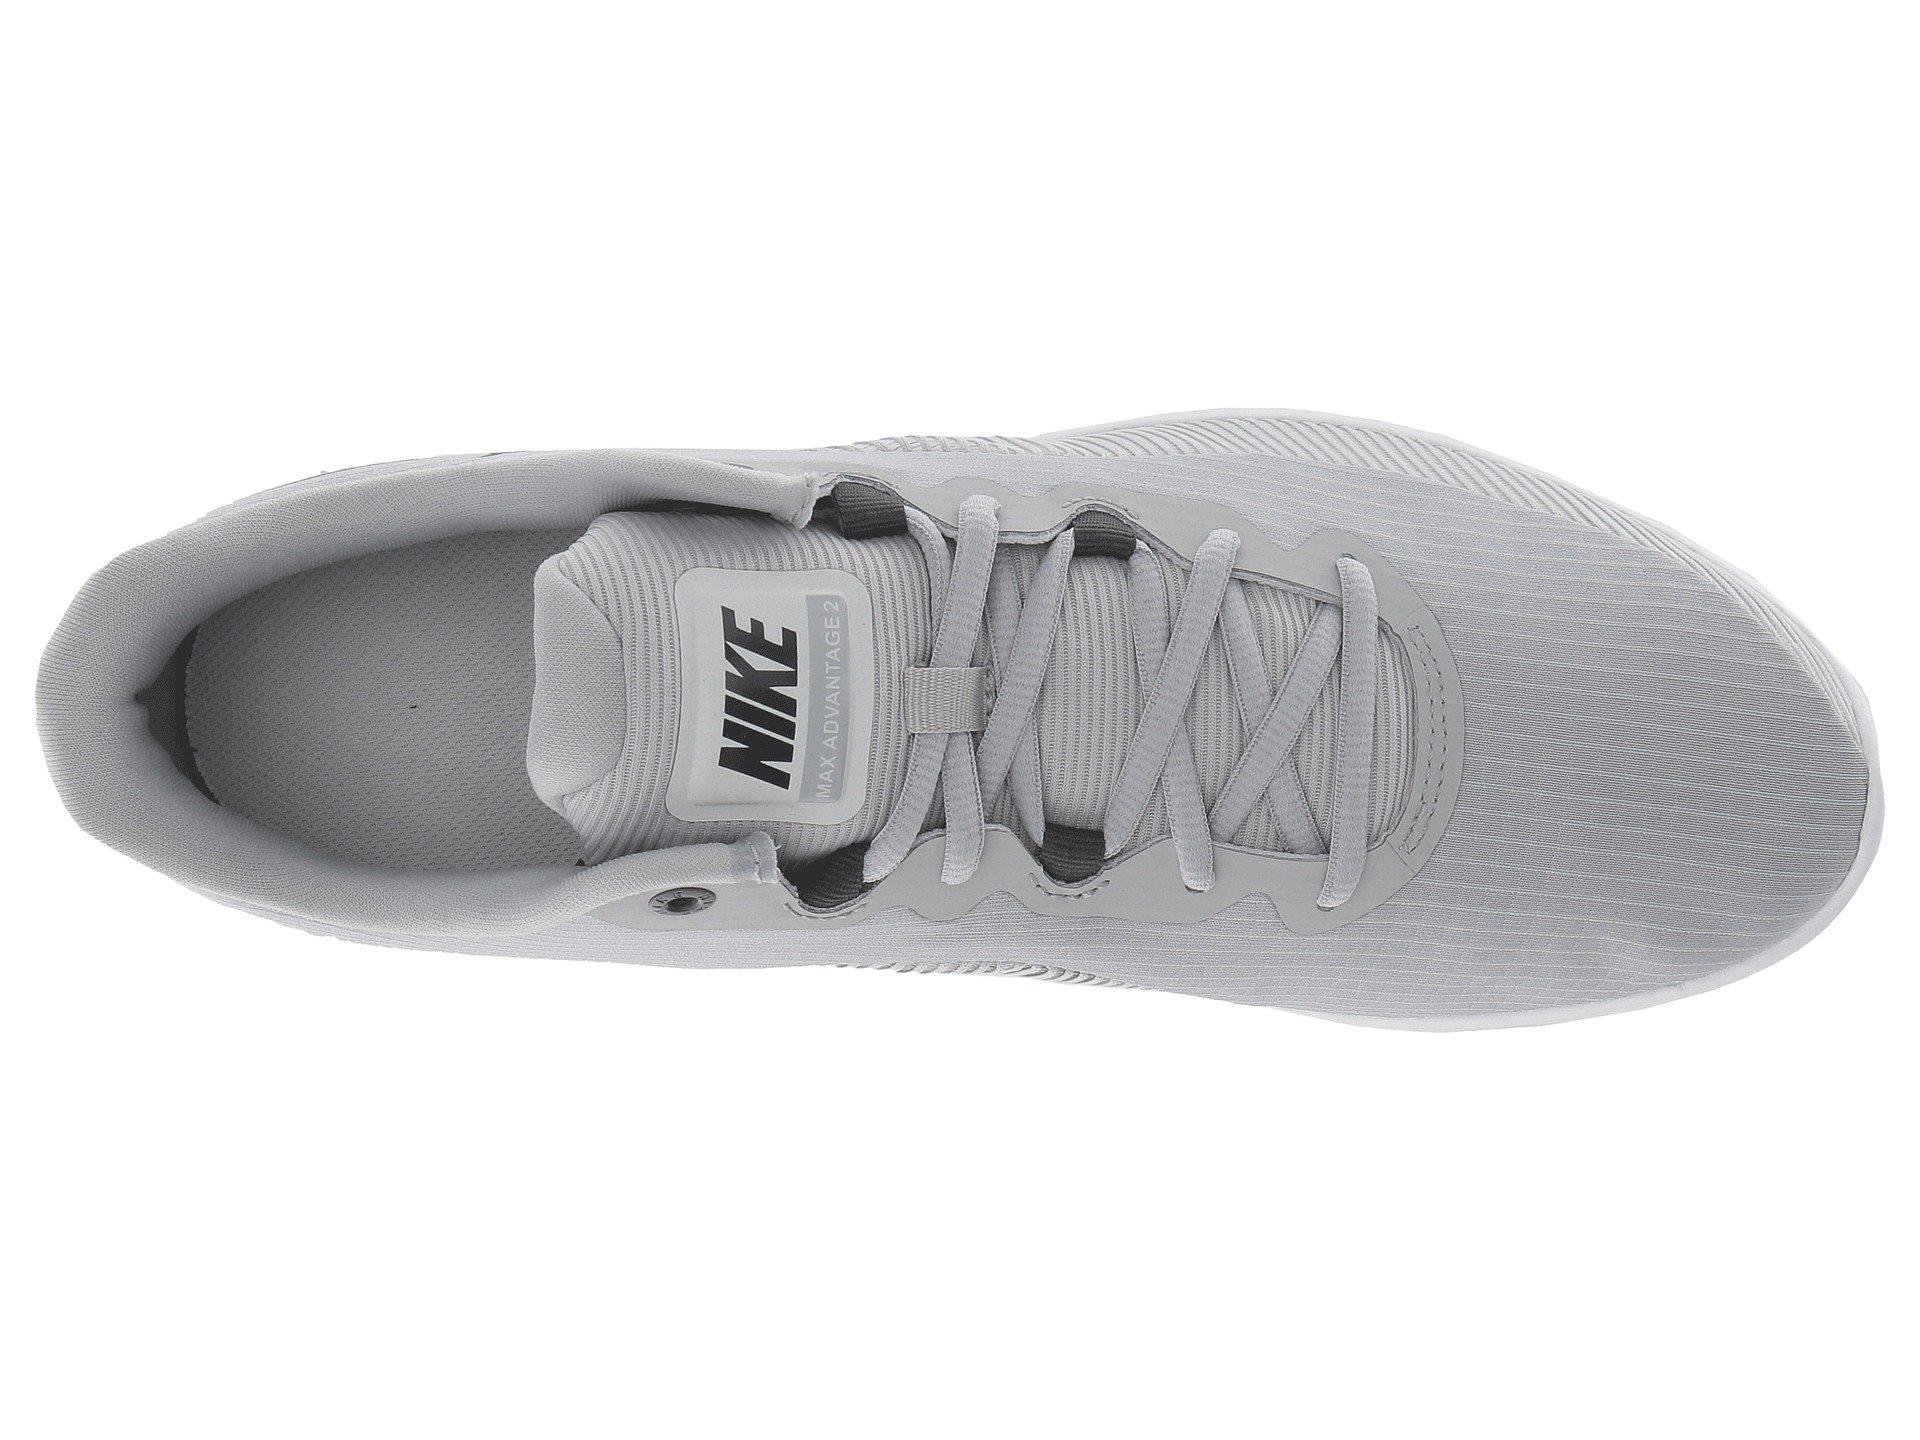 on sale 78eca a55f7 Air Platinum Advantage Nike BlancNoirpure Lyst Max Homme s 2 zWA5qnYpw